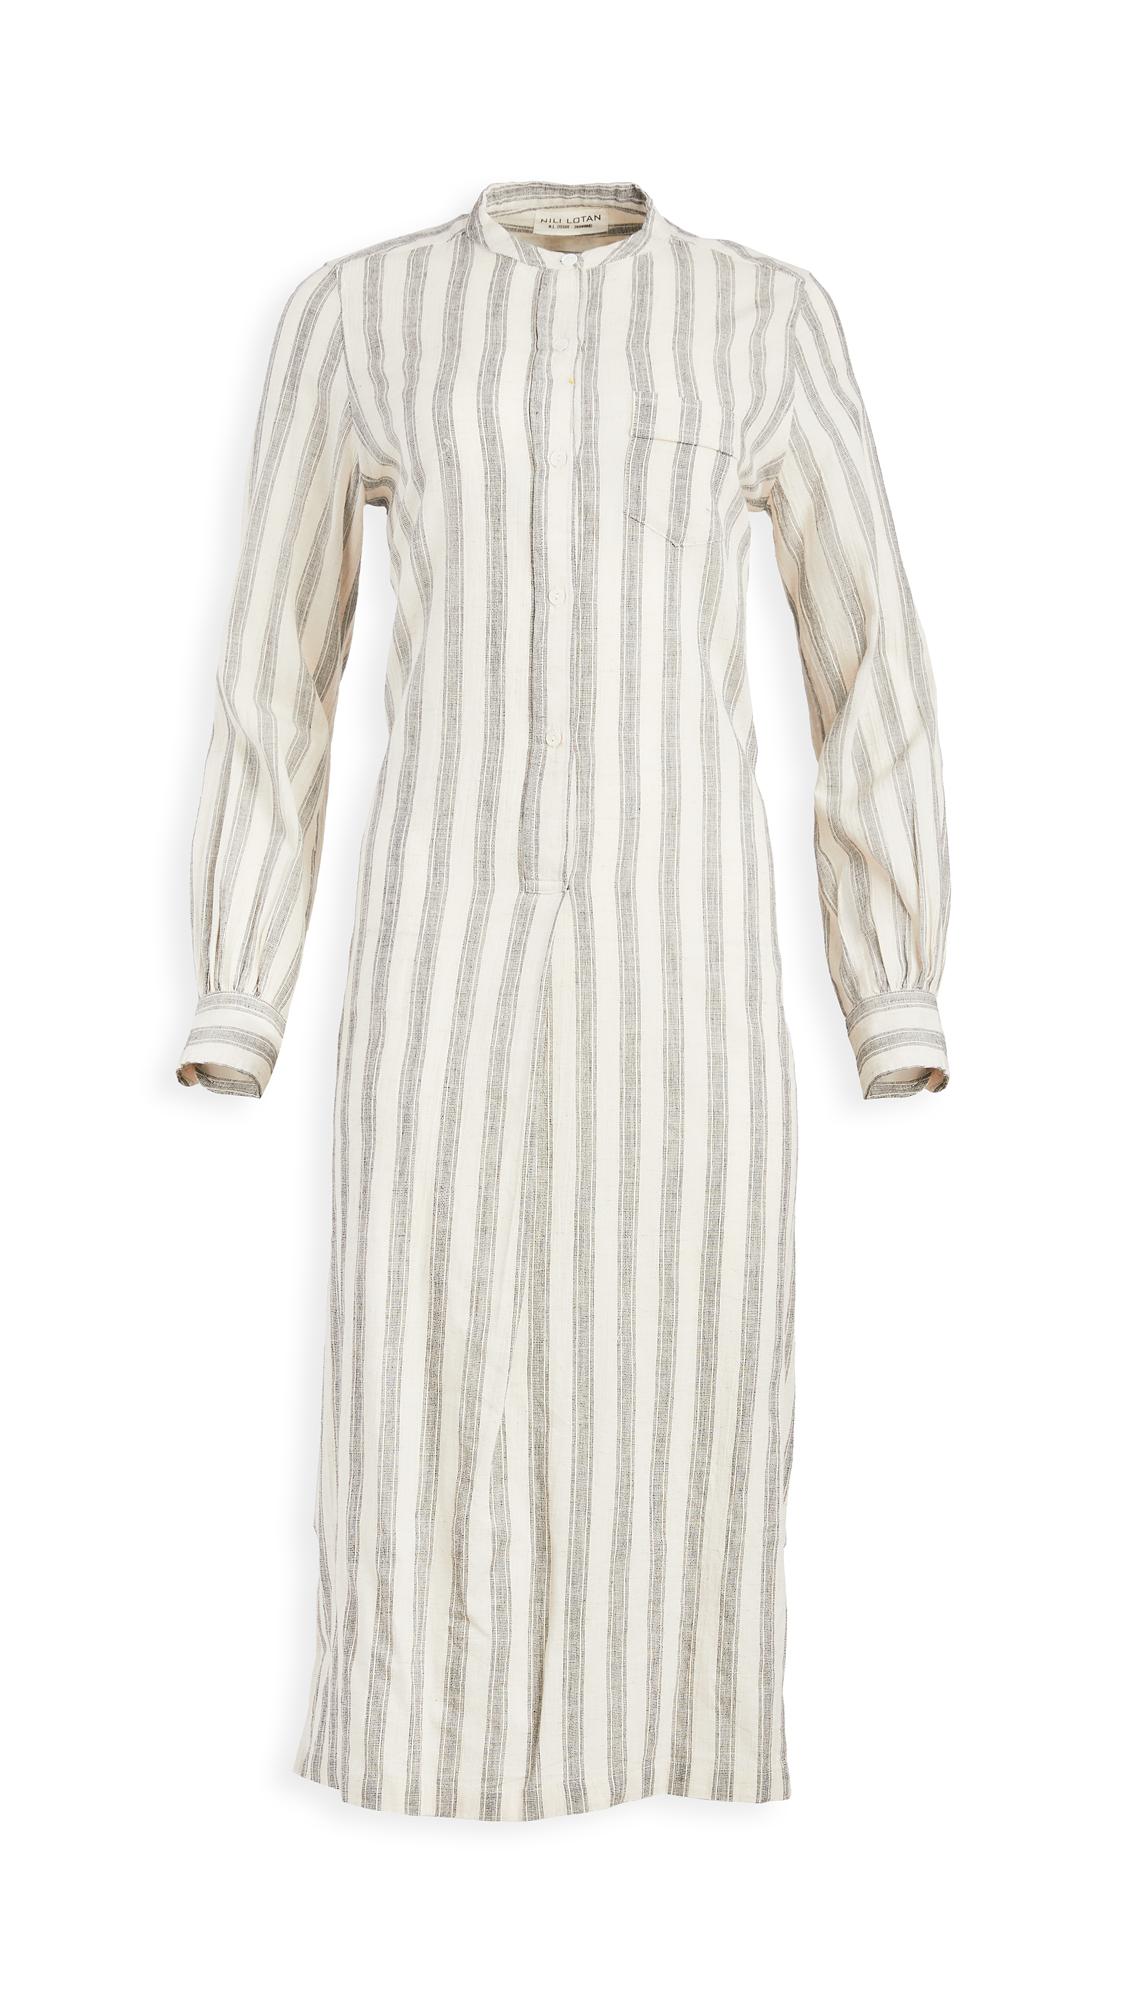 Nili Lotan Malia Dress - 30% Off Sale